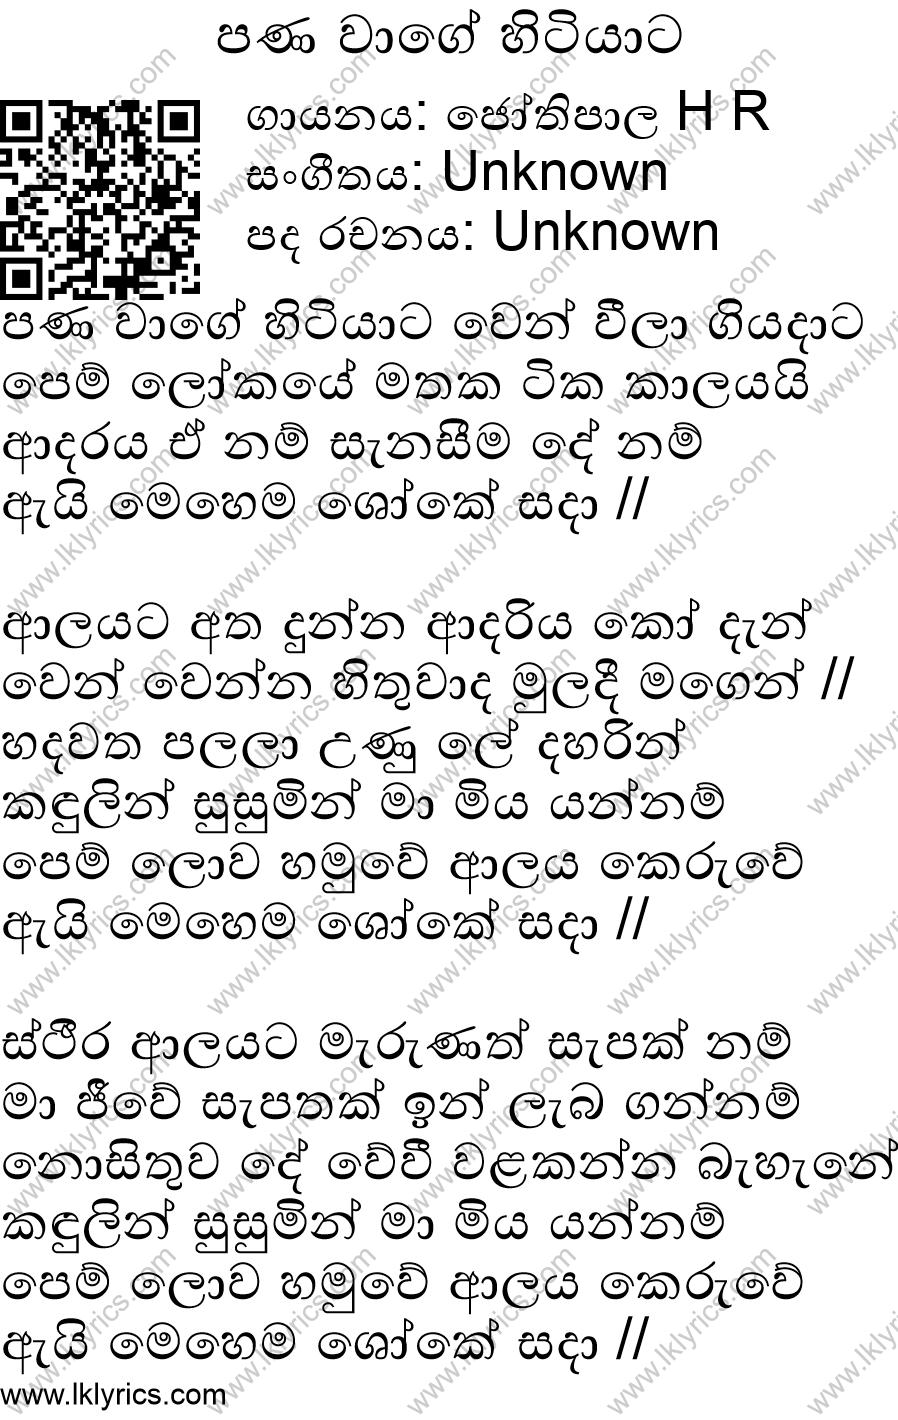 Pana Waage Hitiyaata Lyrics - LK Lyrics